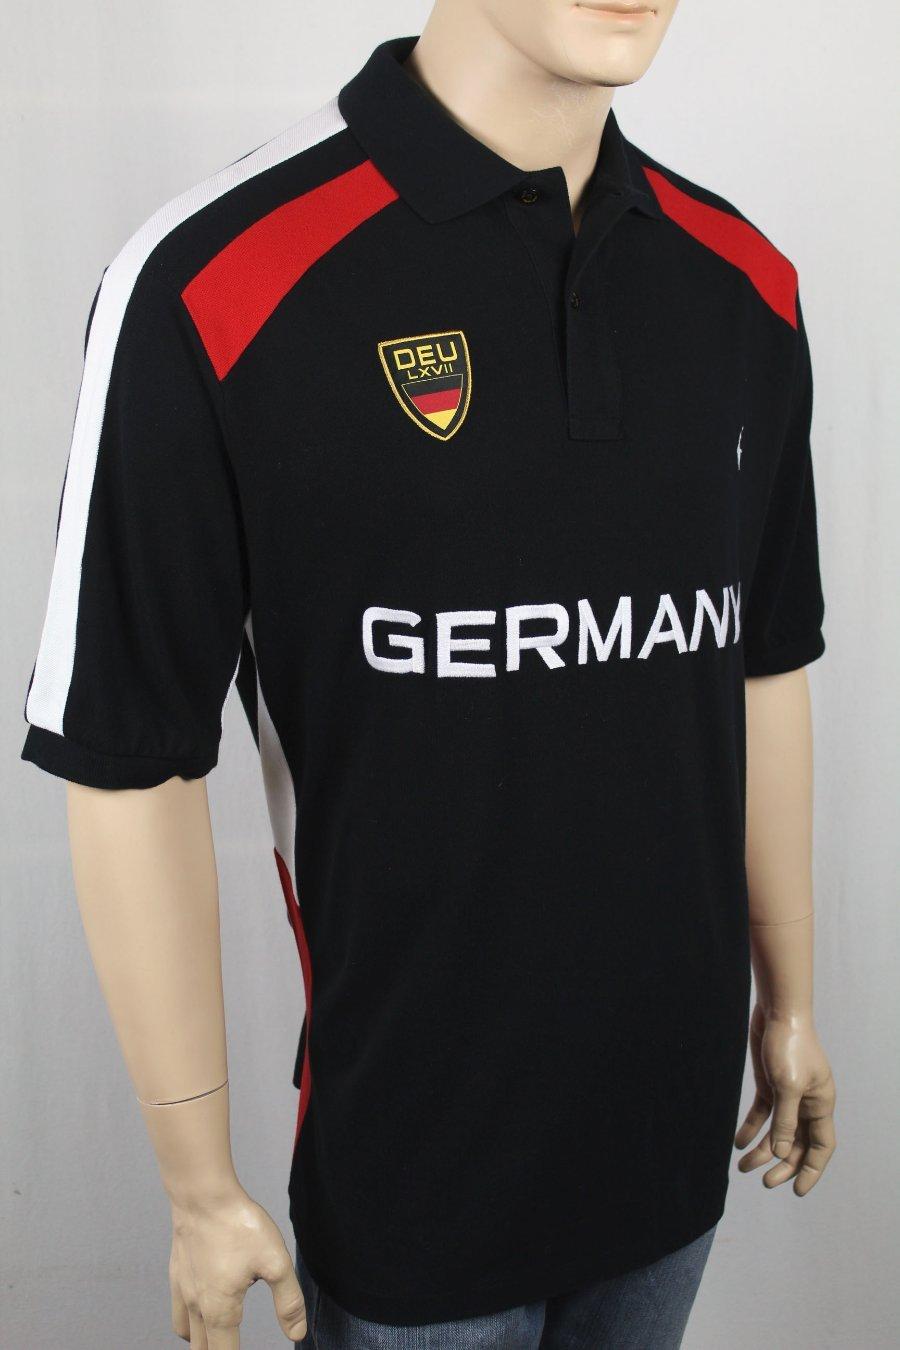 Germany Black Lauren Classic Fit Ralph Polo NwtEbay LAjqR543